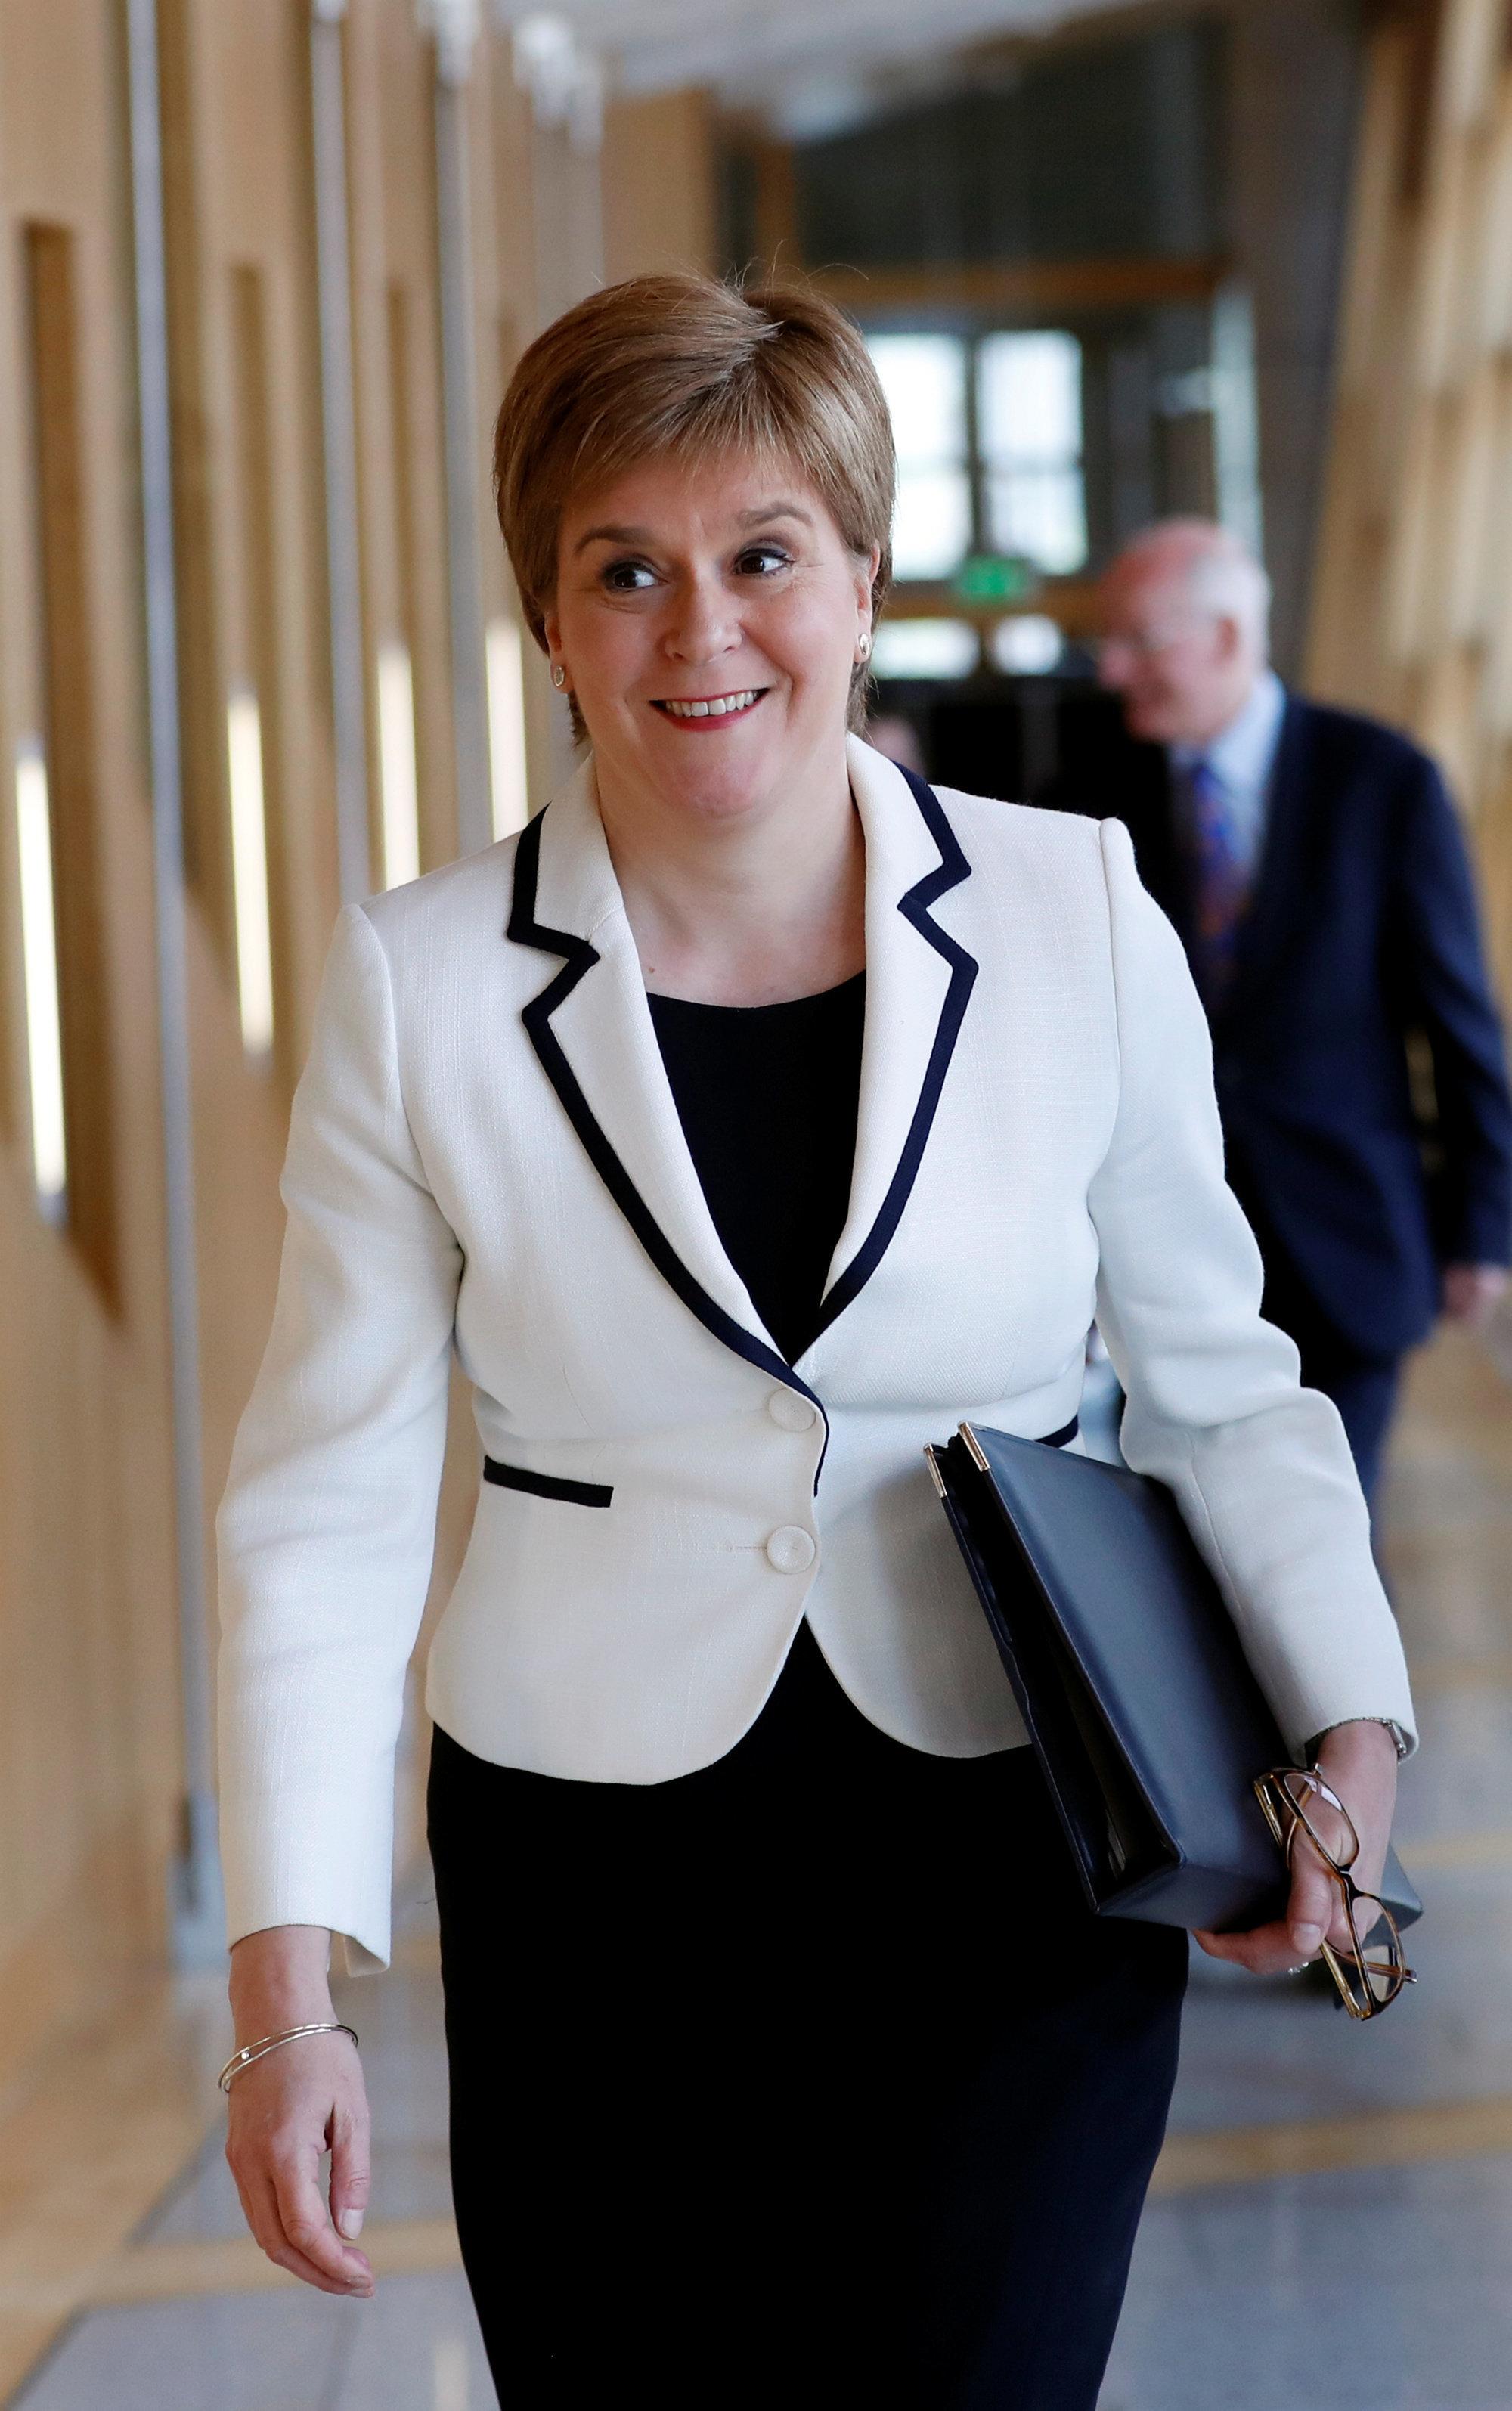 Escocia propondrá un segundo referéndum de independencia en esta